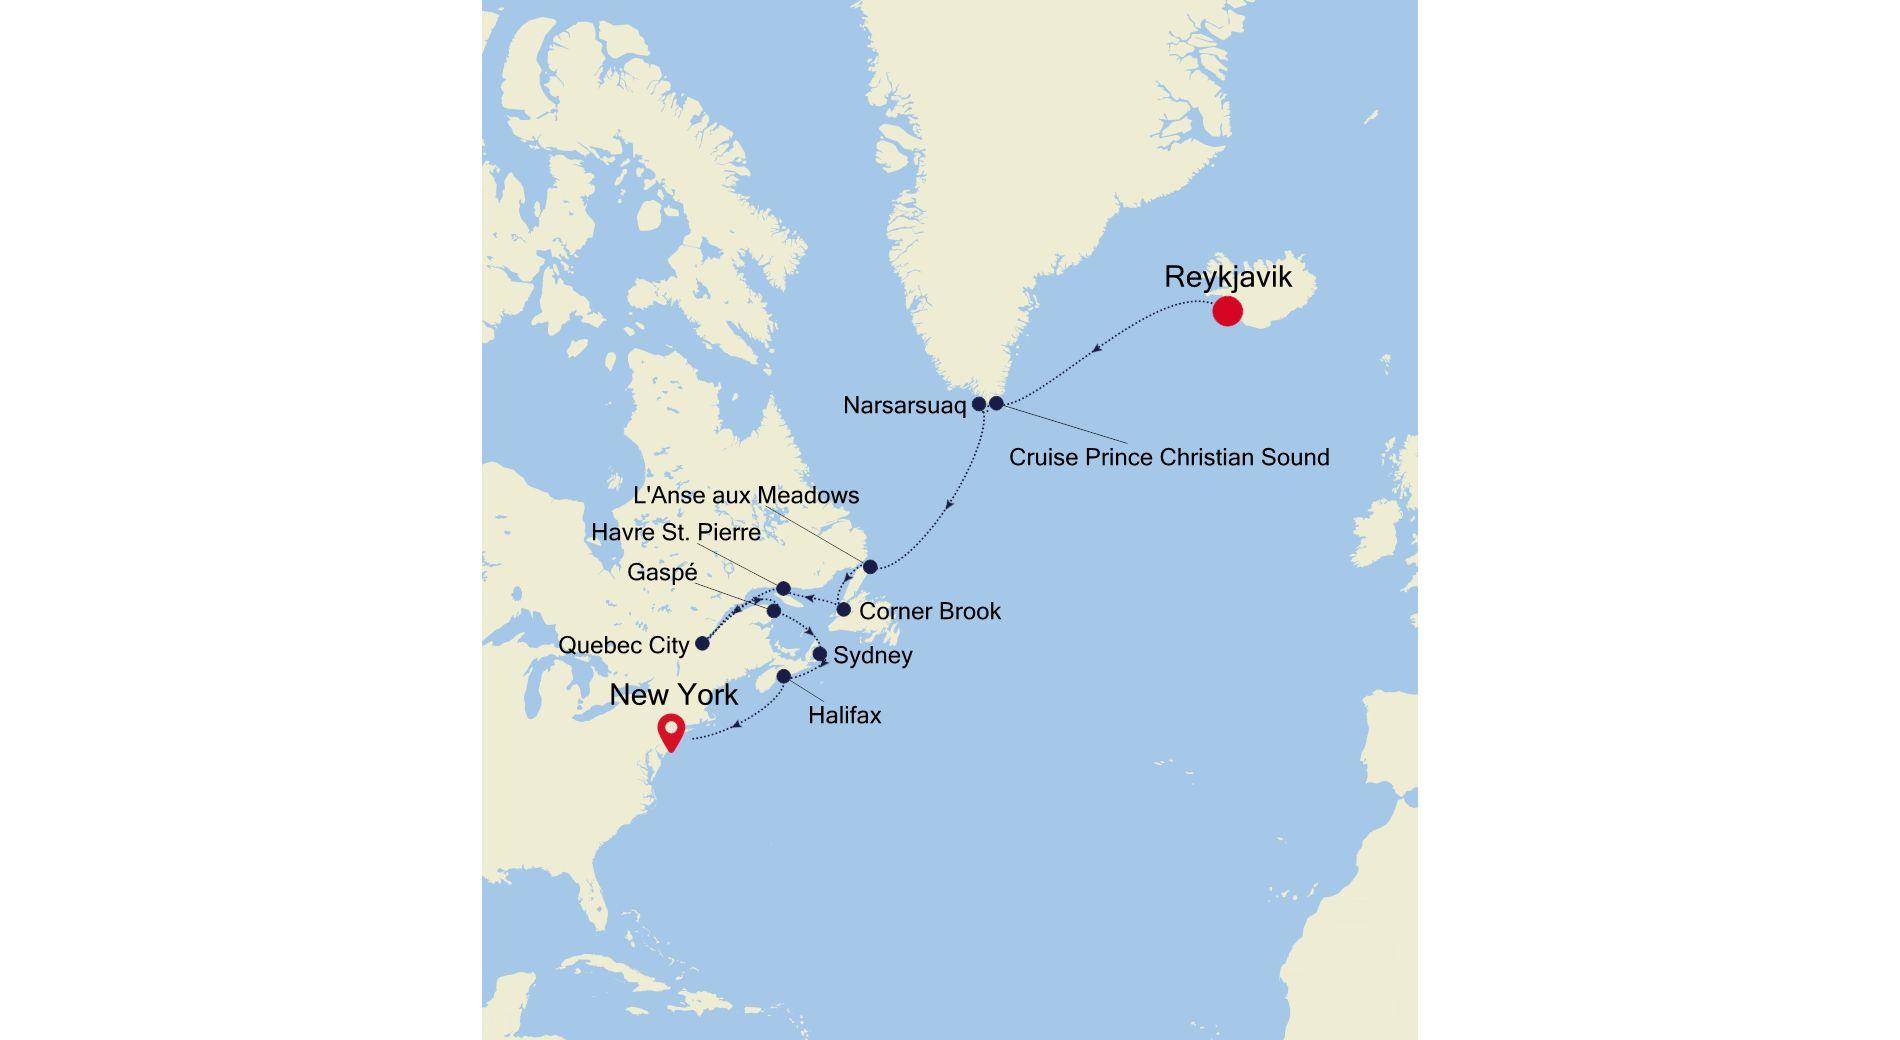 WH210831016 - Reykjavik à New York